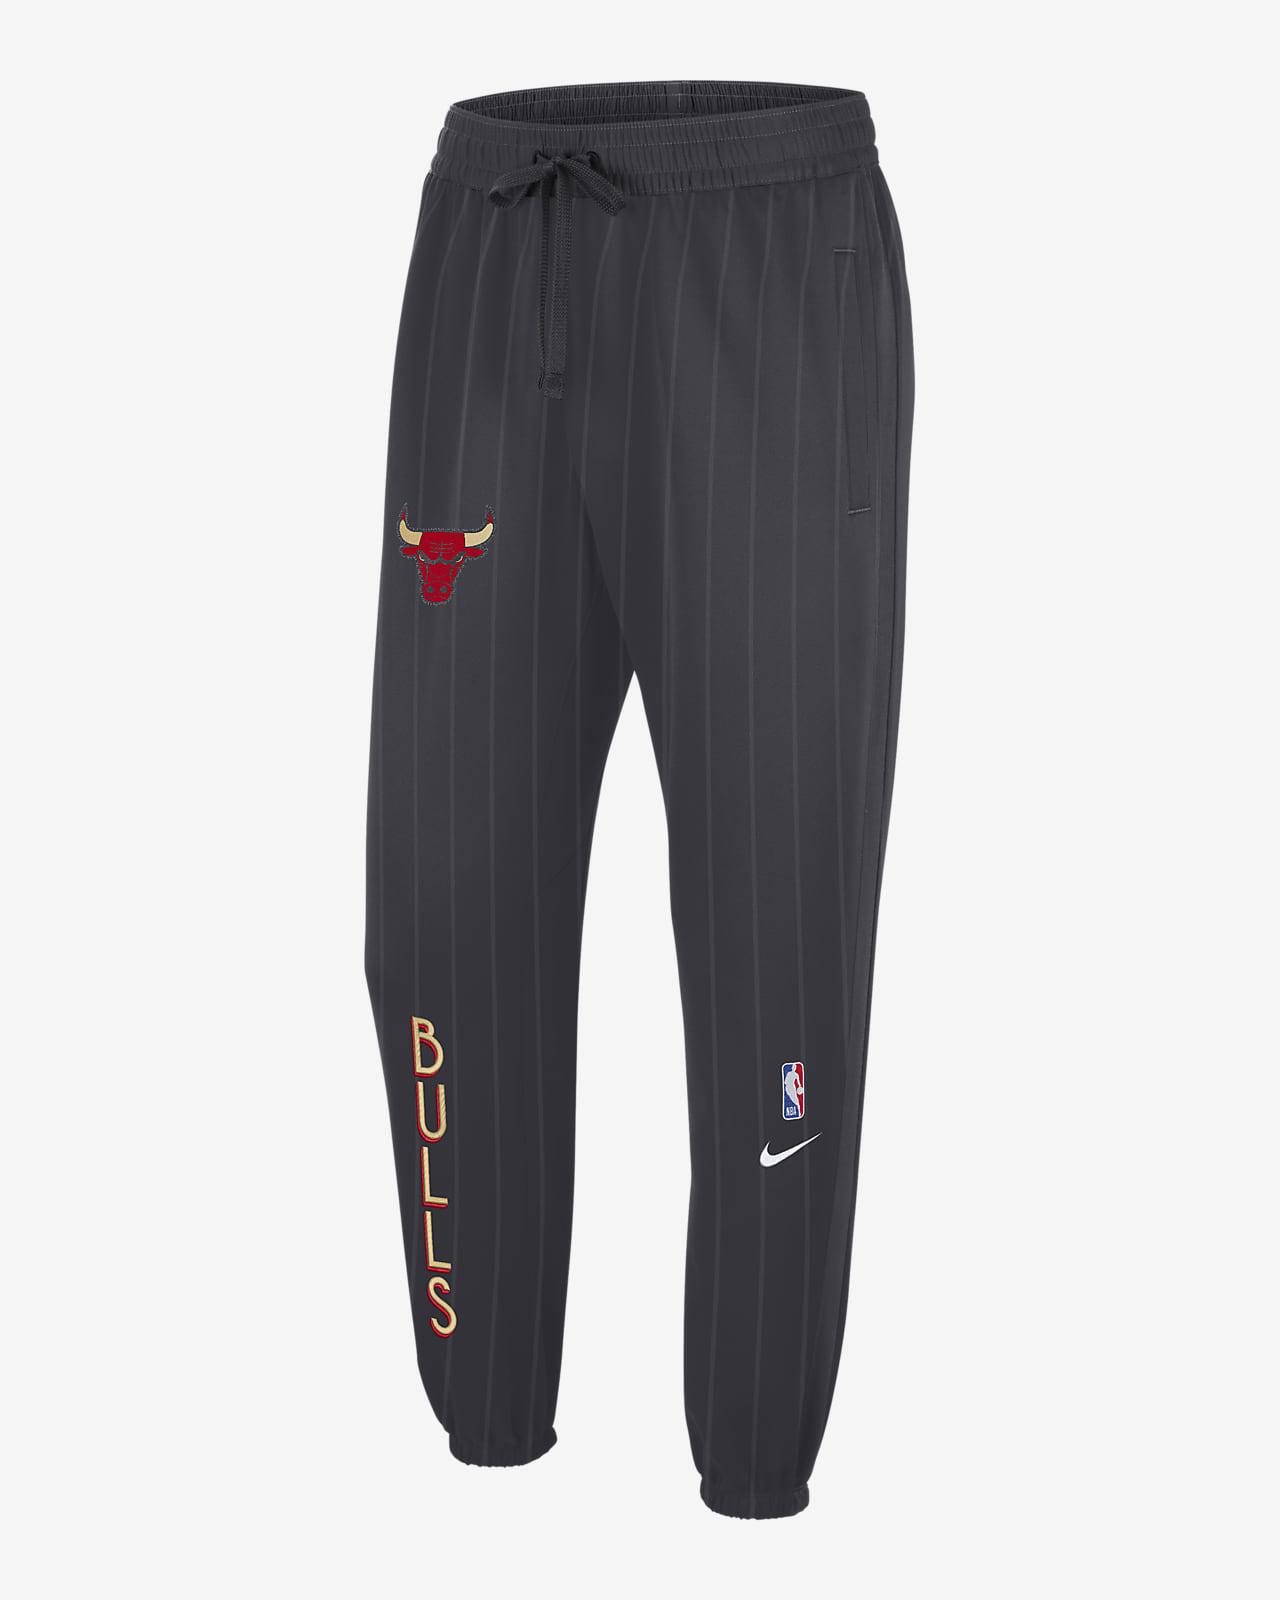 Pantaloni Chicago Bulls Showtime City Edition Nike Therma Flex NBA - Uomo